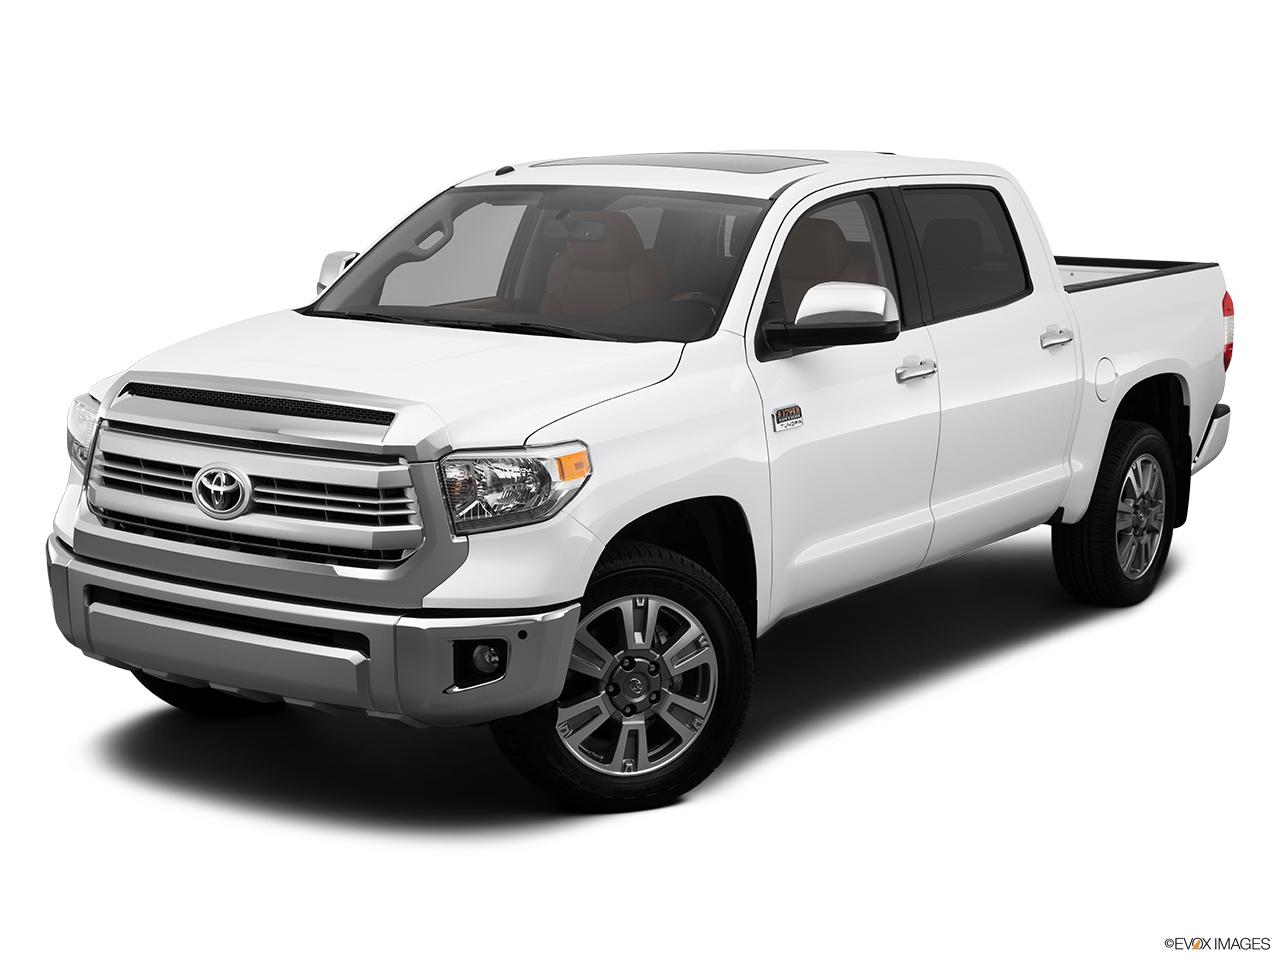 2014 toyota tundra 4wd truck crewmax 5 7l v8 6 spd automatic platinum. Black Bedroom Furniture Sets. Home Design Ideas